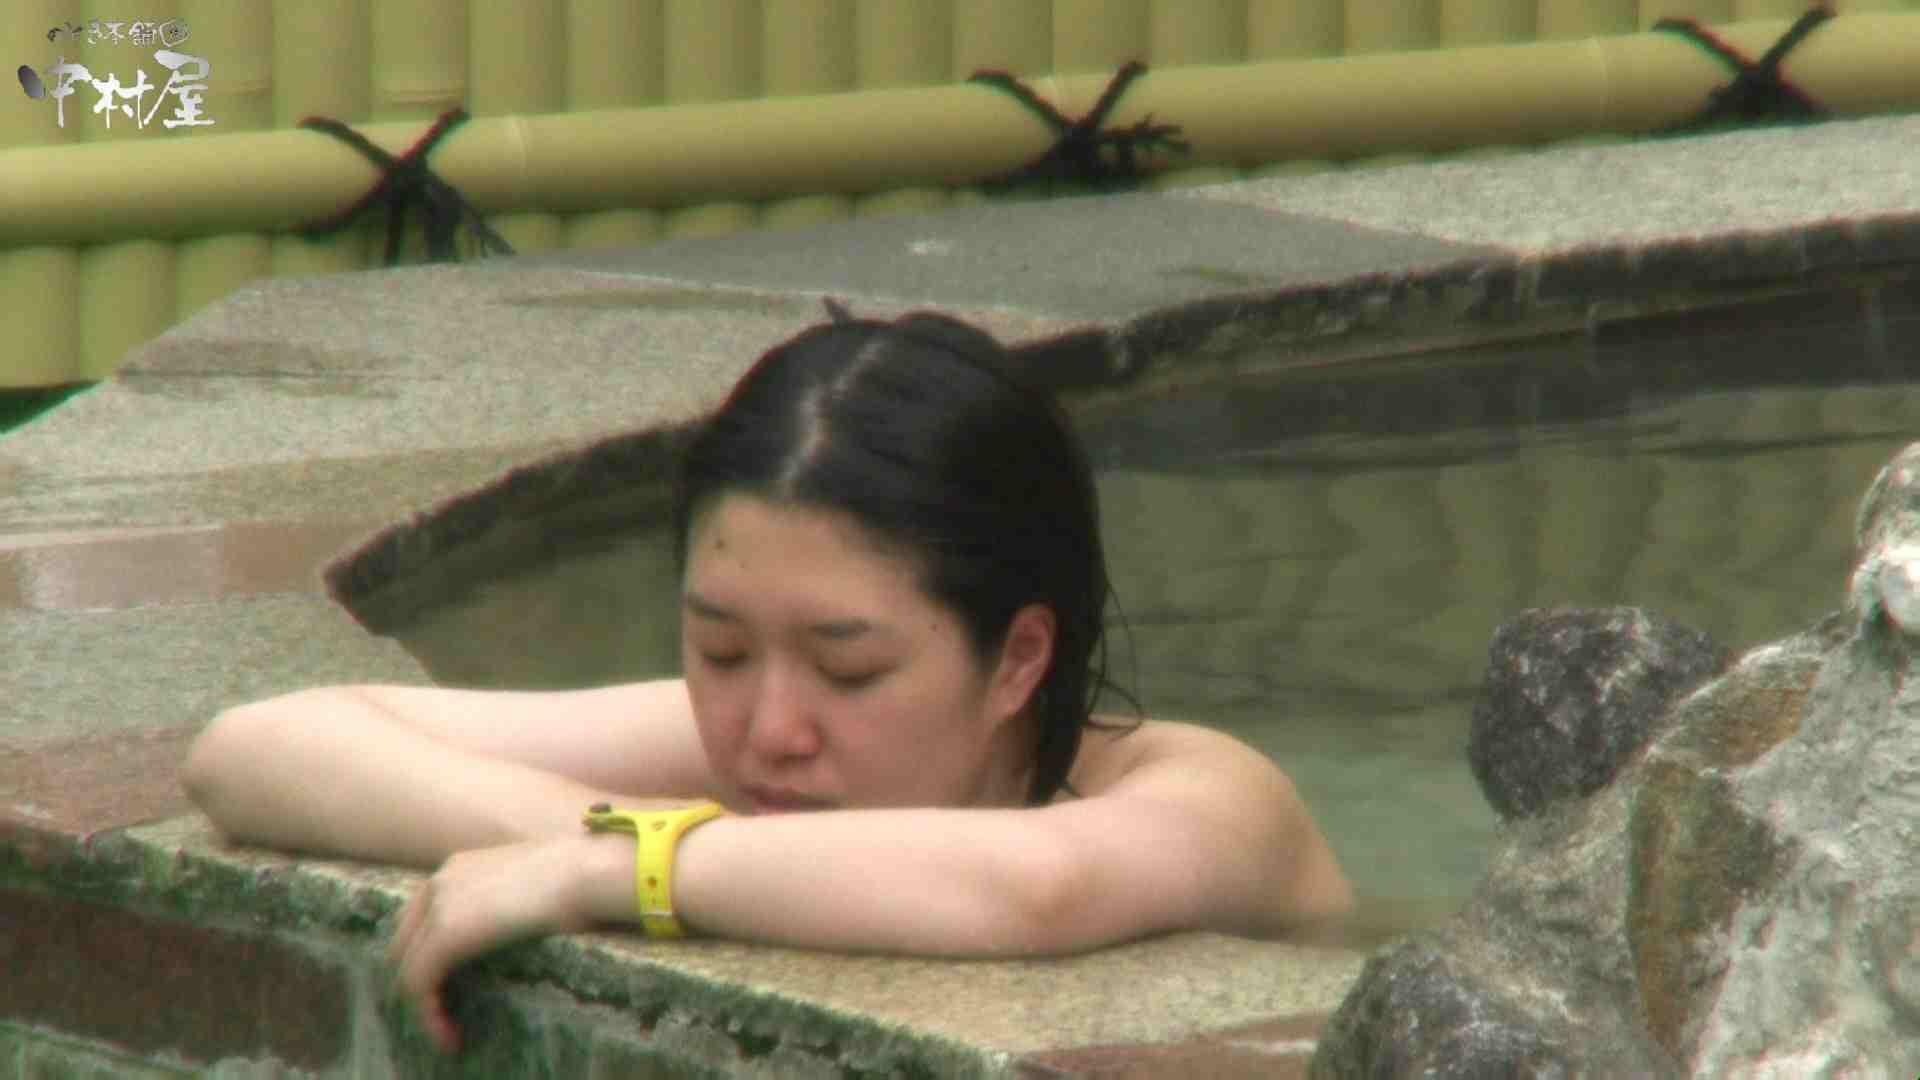 Aquaな露天風呂Vol.946 露天 オマンコ無修正動画無料 95連発 41